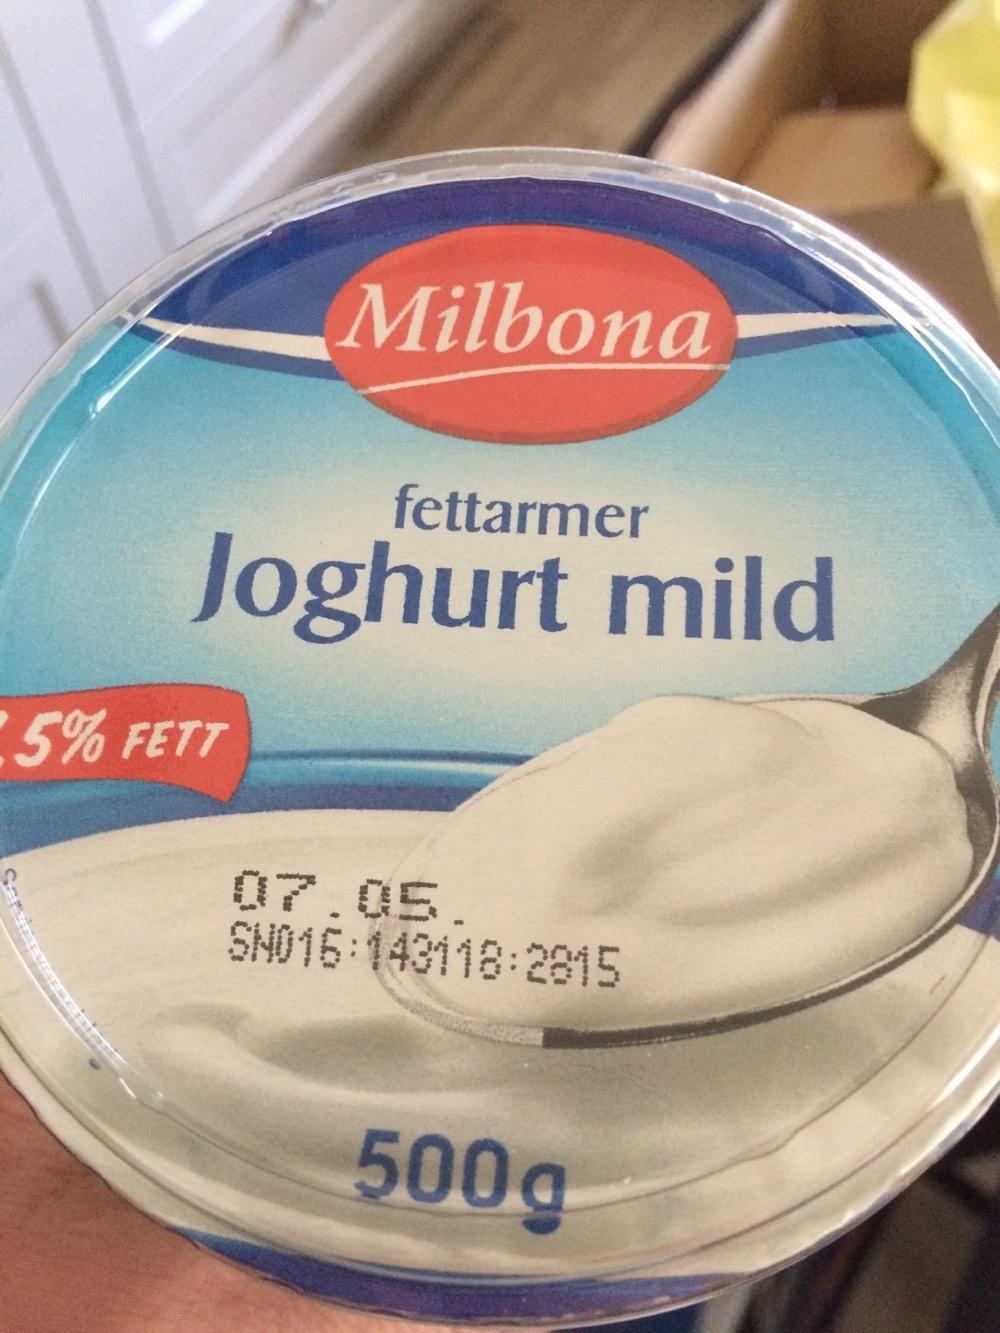 Roeryoghurt halfvol - Produit - fr